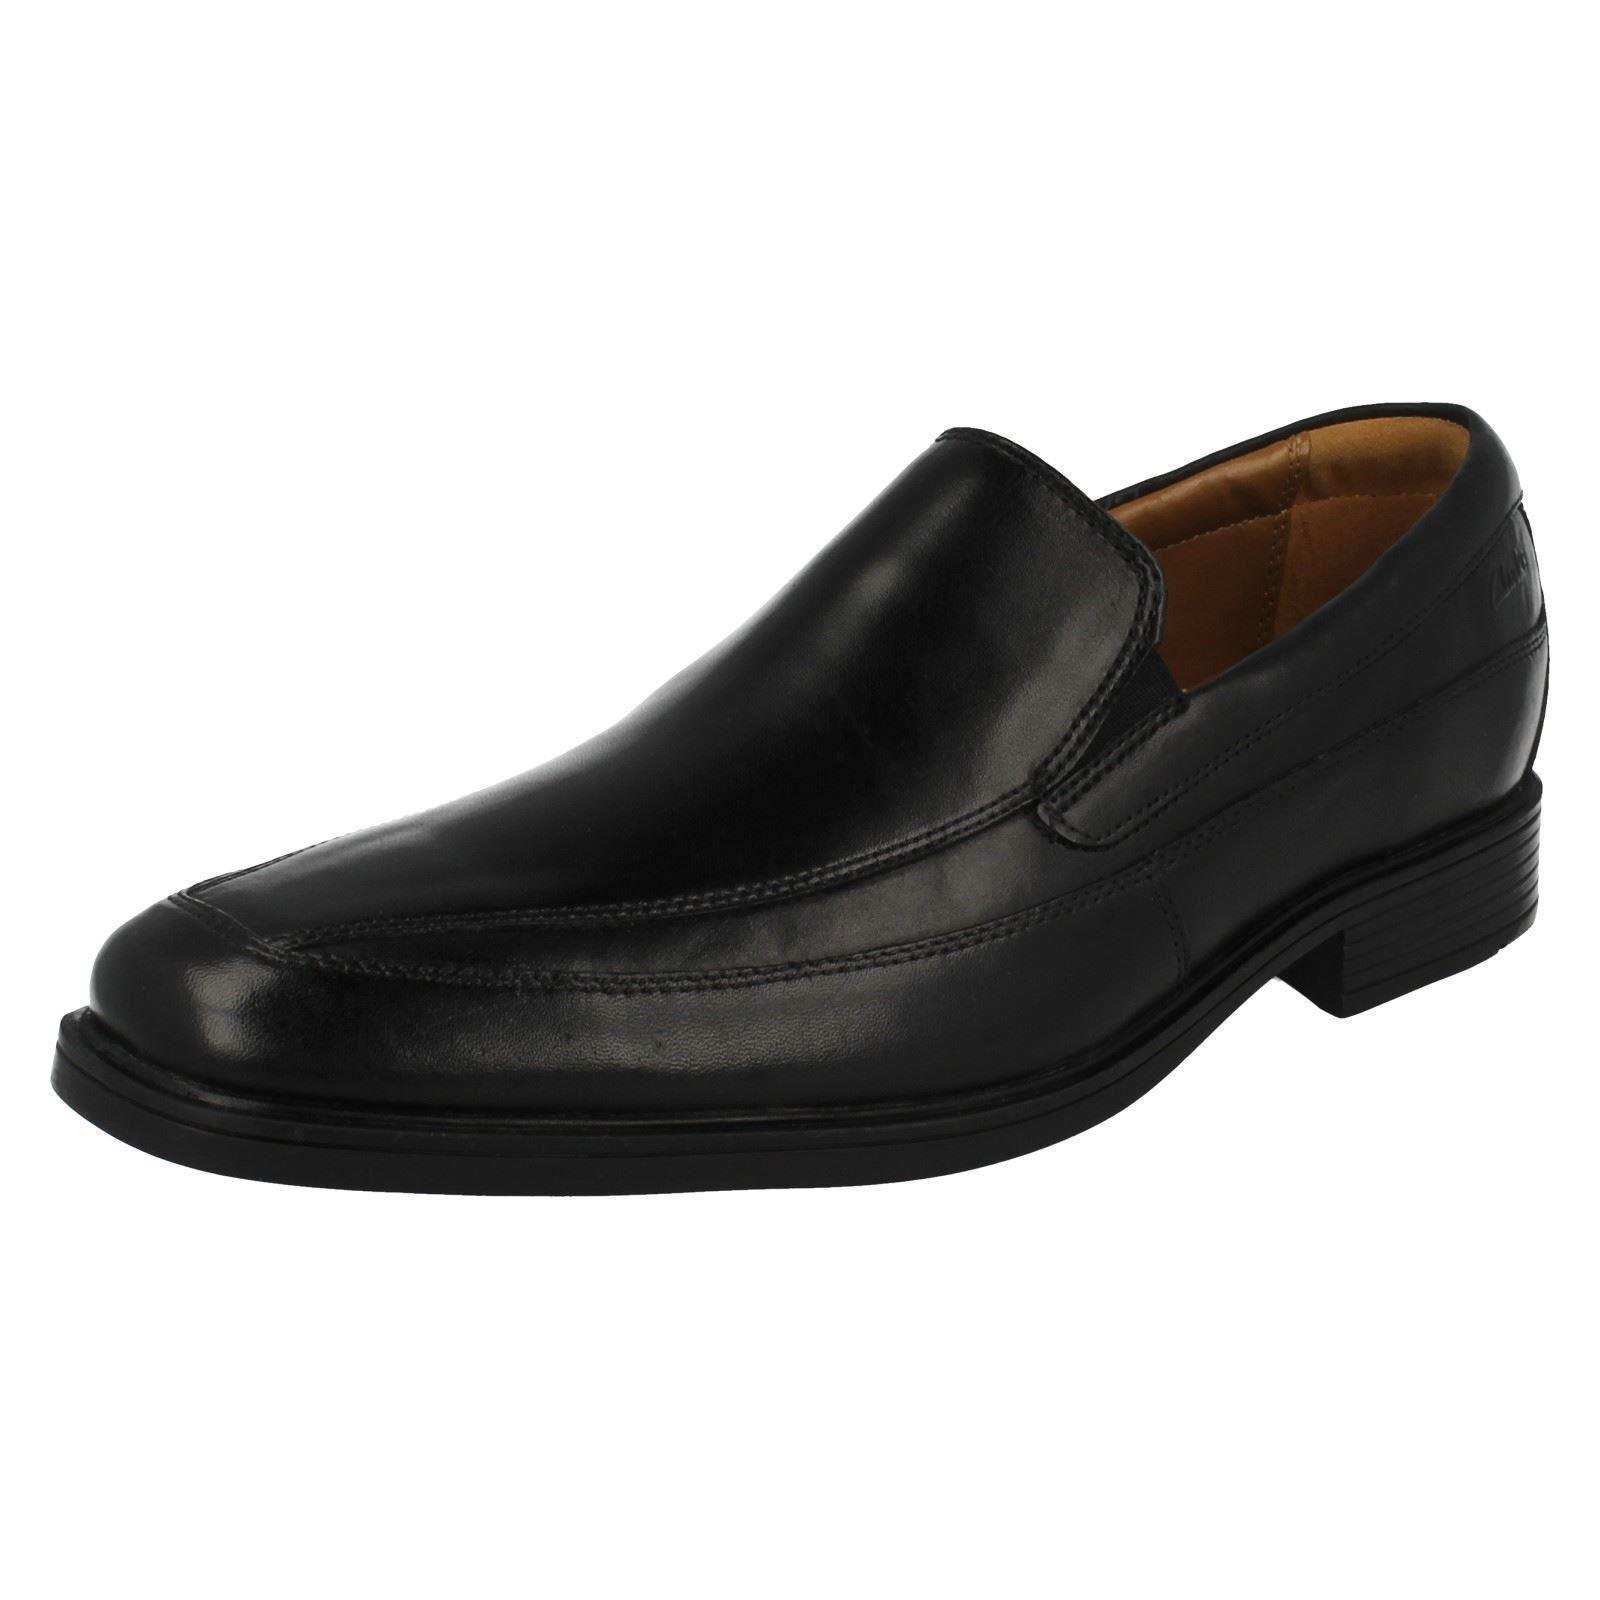 Clarks Tela Tilden Free  Cuero Negro Tela Clarks Deslizable Cómodo Calzado Informal d07ed2